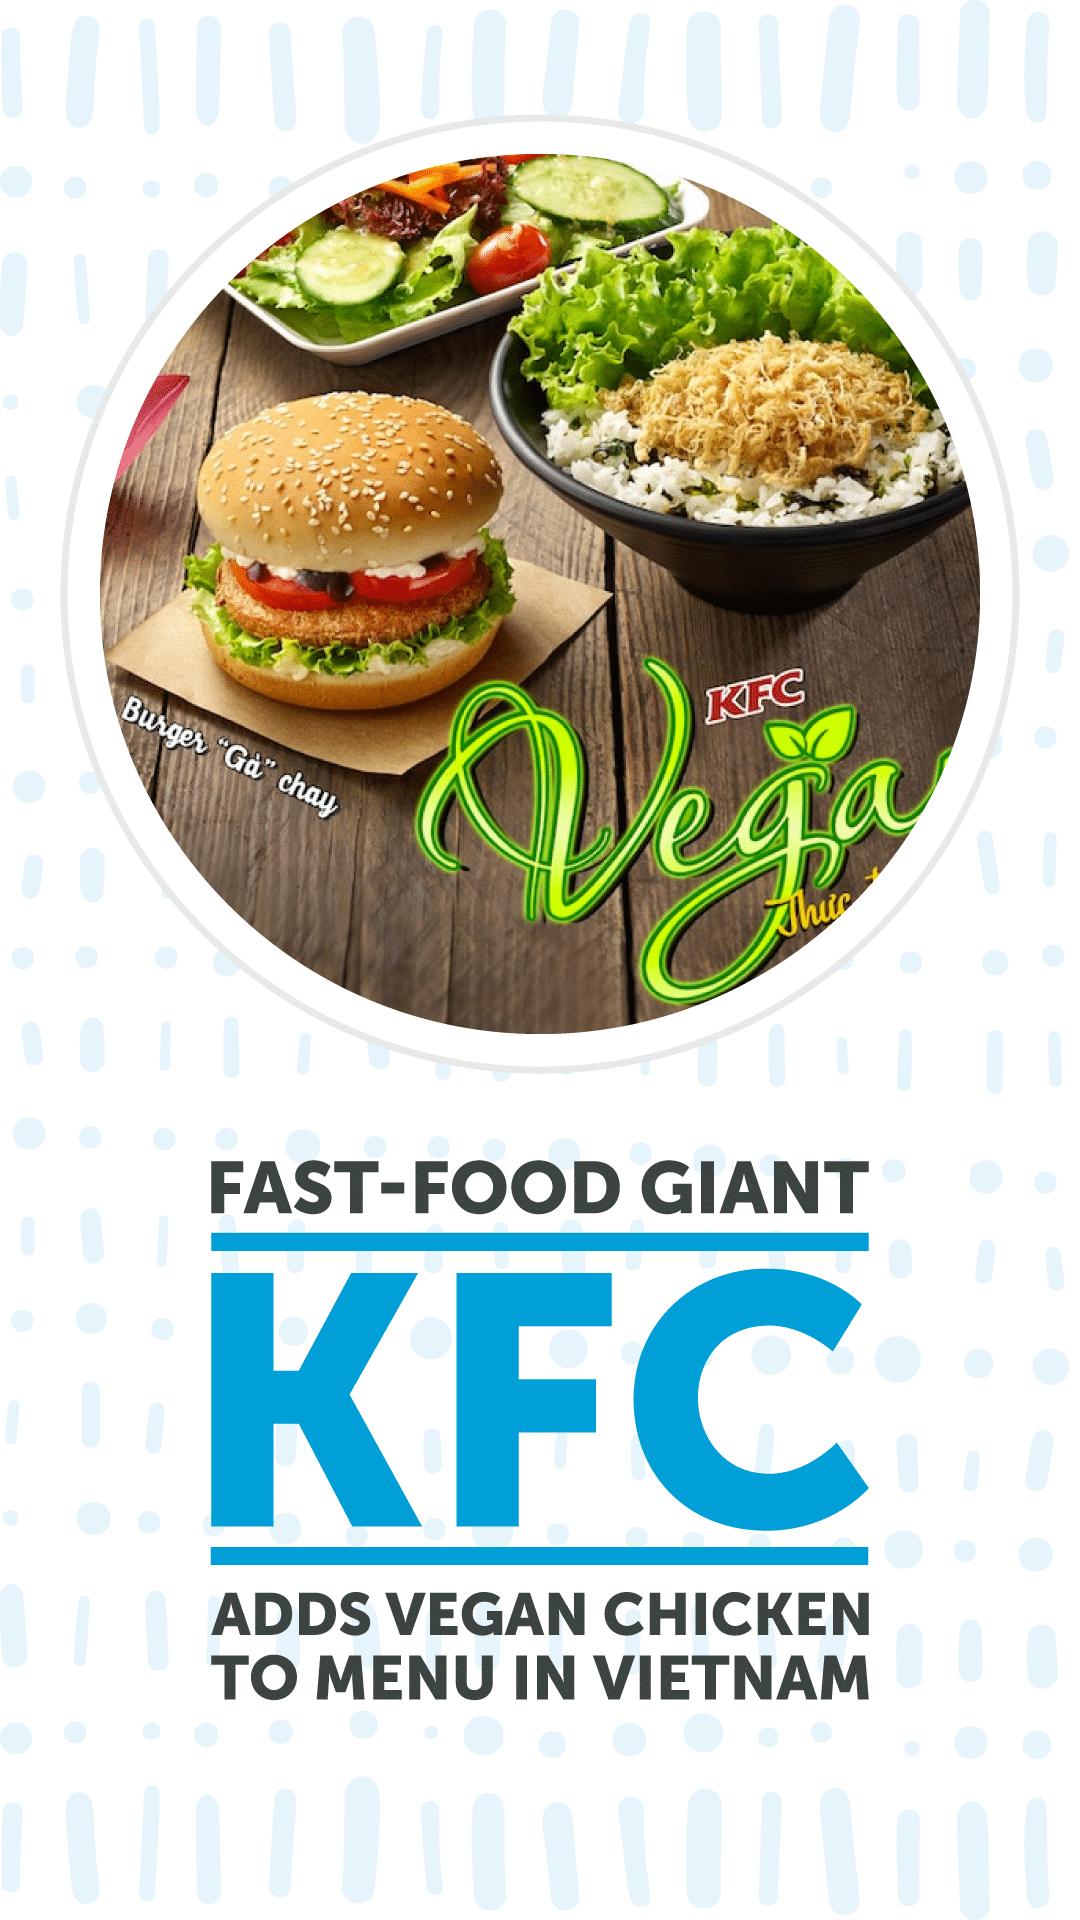 Fast-Food Giant KFC Adds Vegan Chicken to Menu in Vietnam